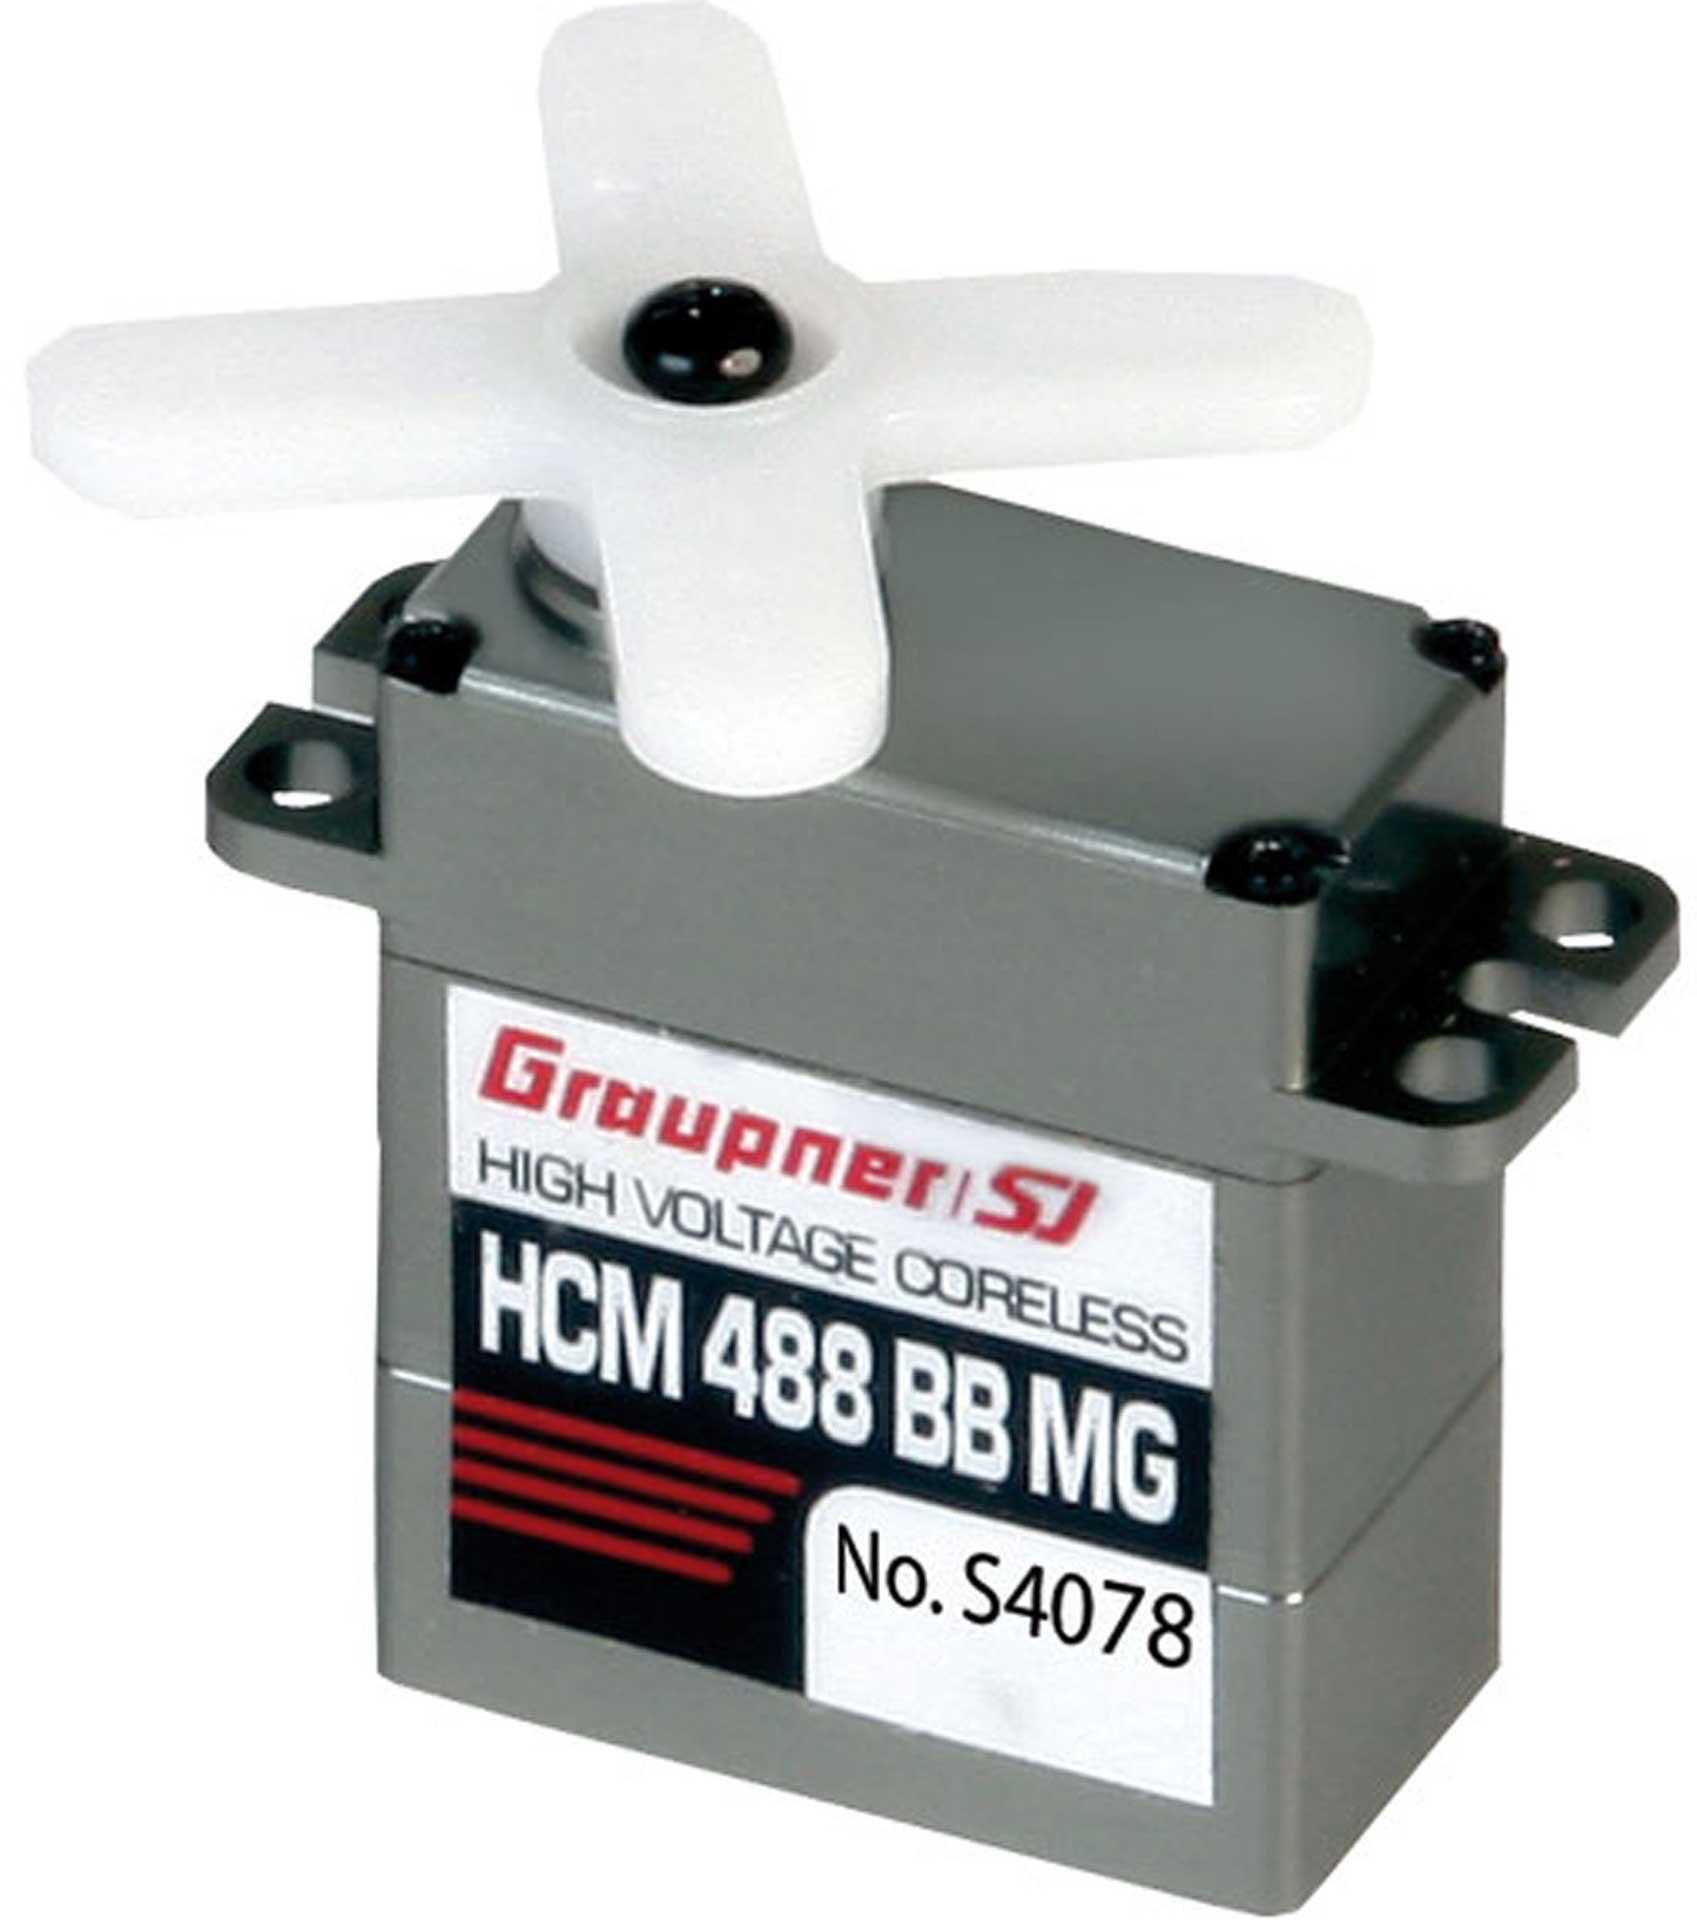 GRAUPNER HCM 488 BB MG High-Speed 12mm HV CL Digital Servo